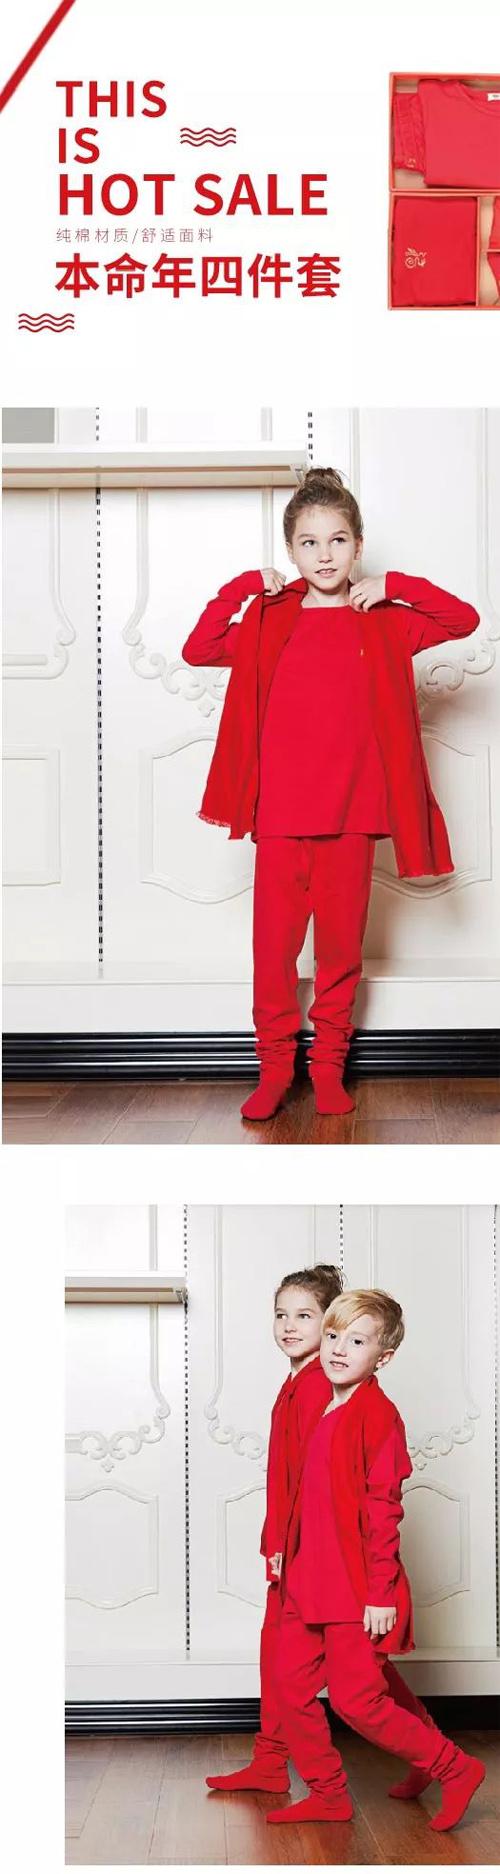 NEW YEAR丨新年新装!护身福礼盒套装震撼上市!